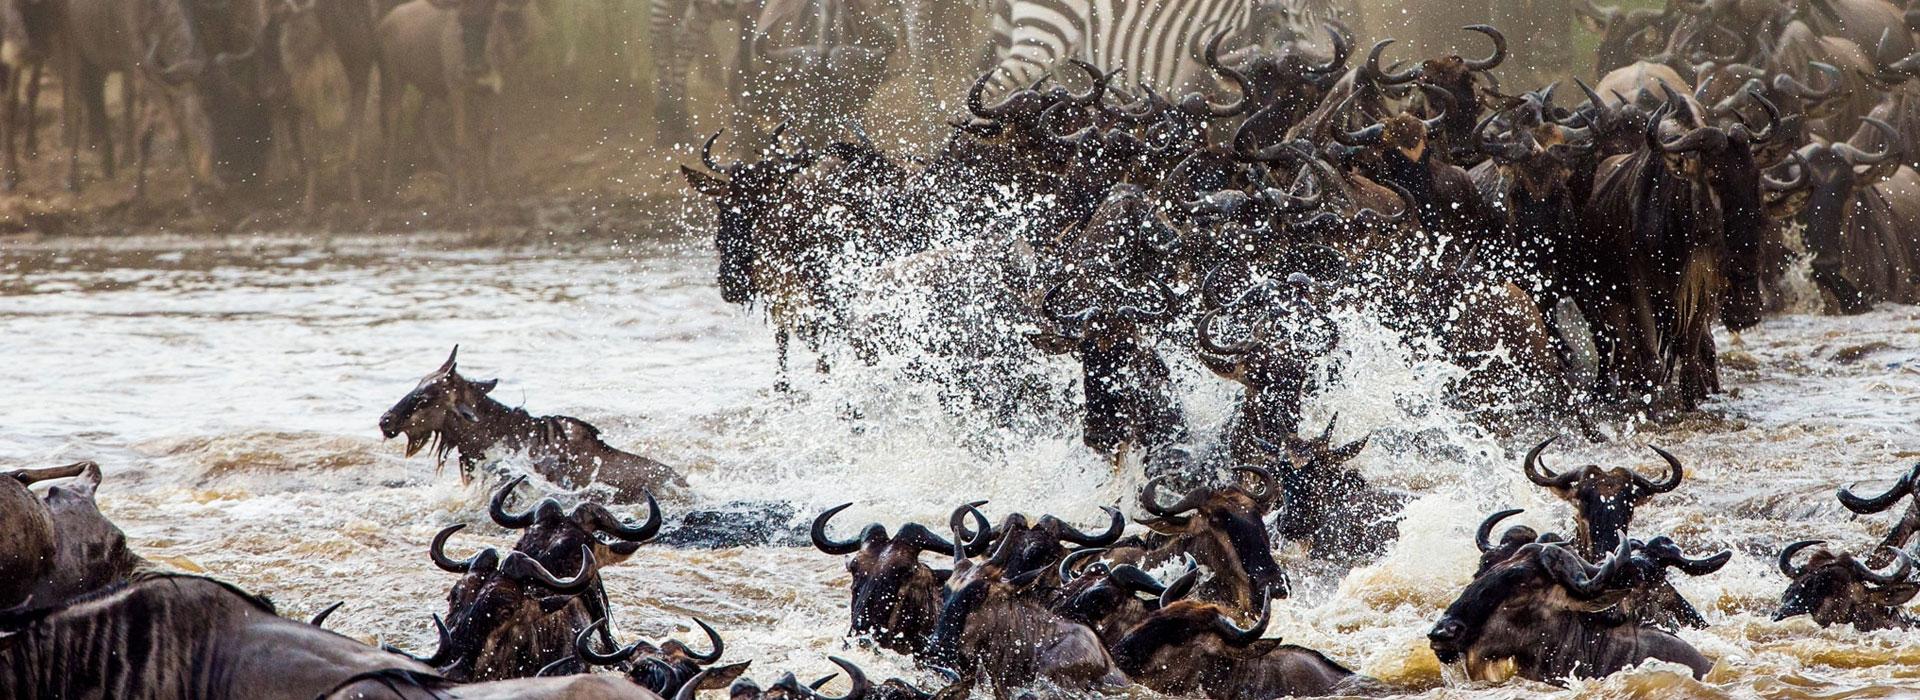 2 Days Masai Mara Wildebeest Migration Safari from Mombasa by Air